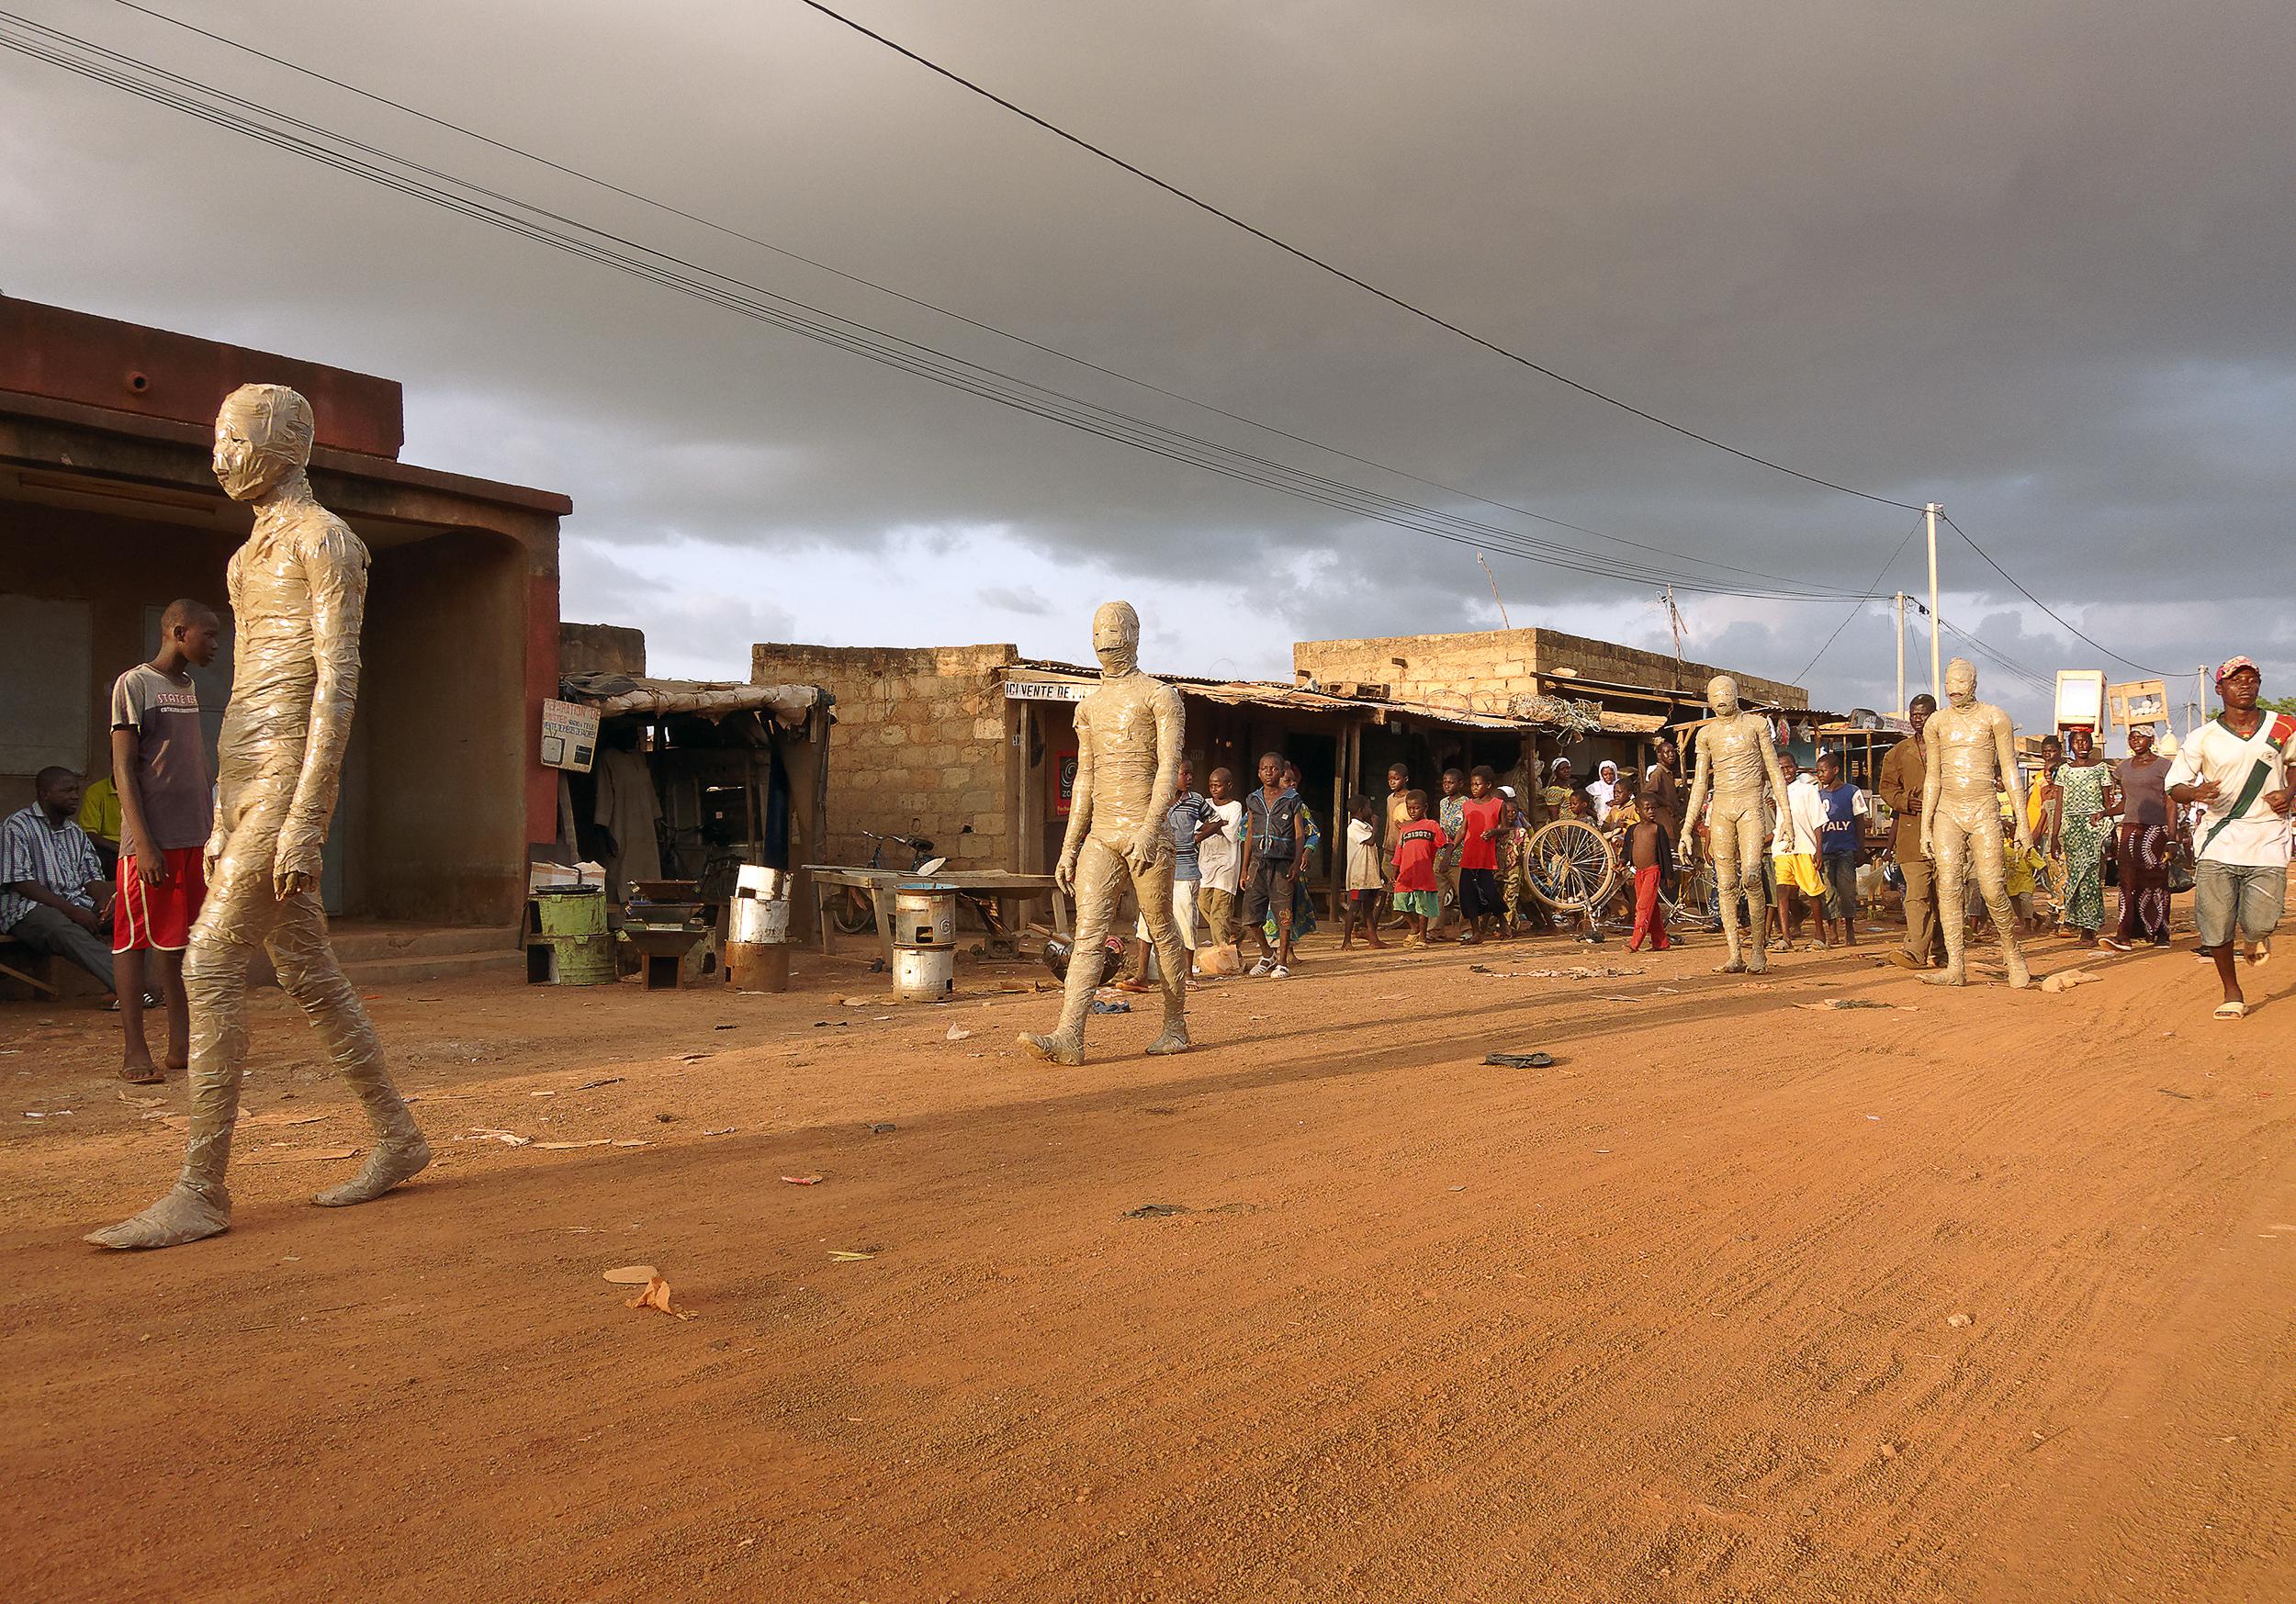 benoit-izard_scotch-crossing-ouagadougou_photo-on-metallic-paper_2018_28X39.5inches_ed-of-8-prints_$2900__HD.jpg